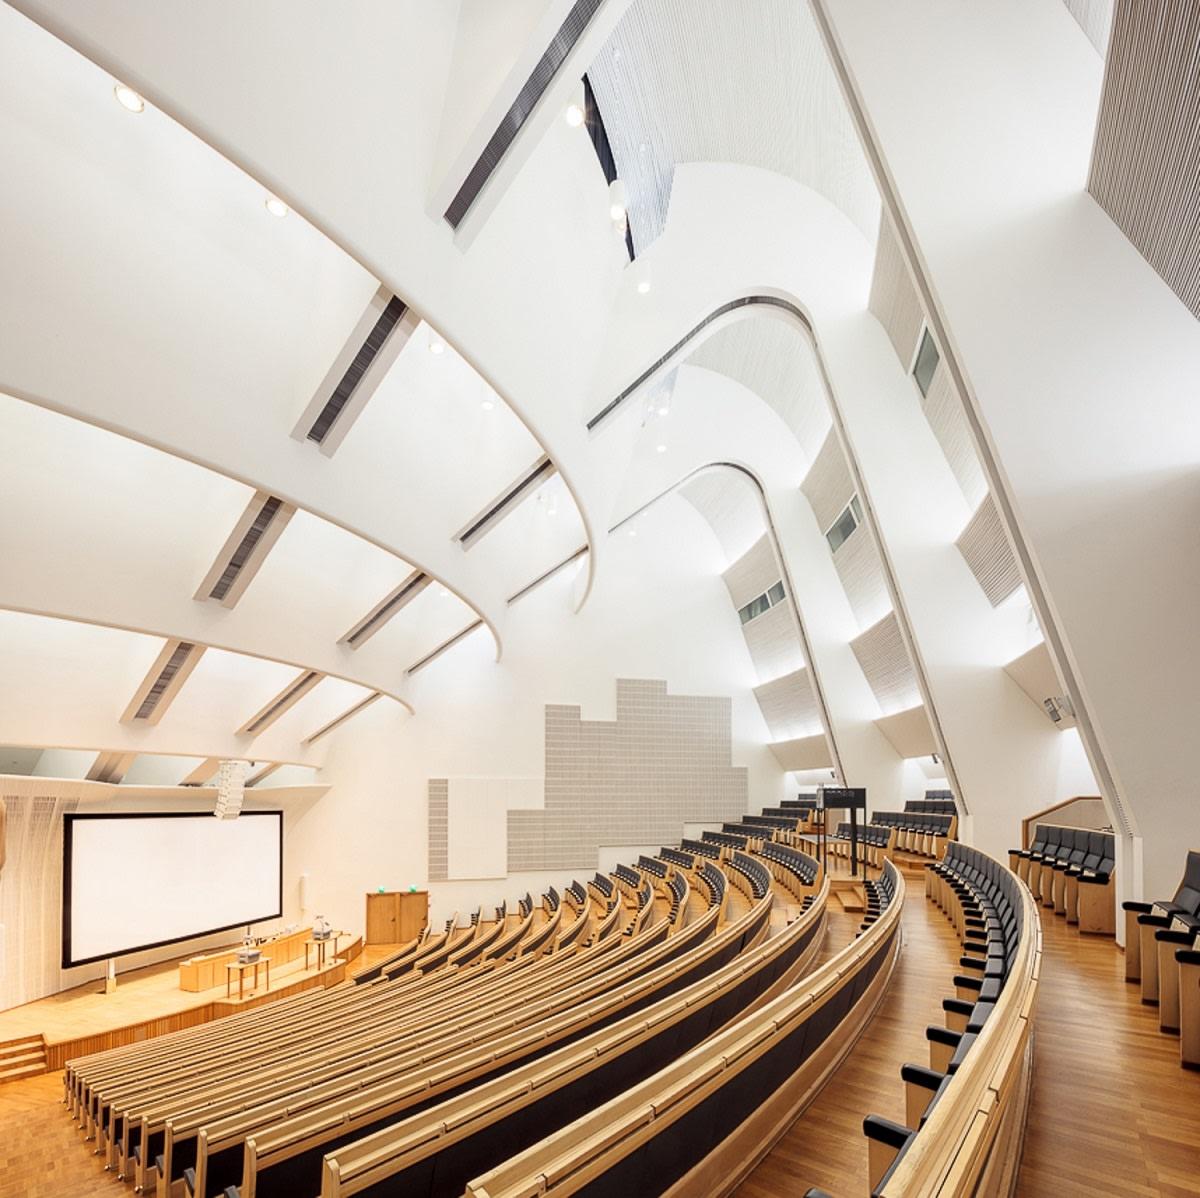 Auditorium of the University of Technology, Helsinki by Alvar Aalto (1964)   Source: finnisharchitecture.fi